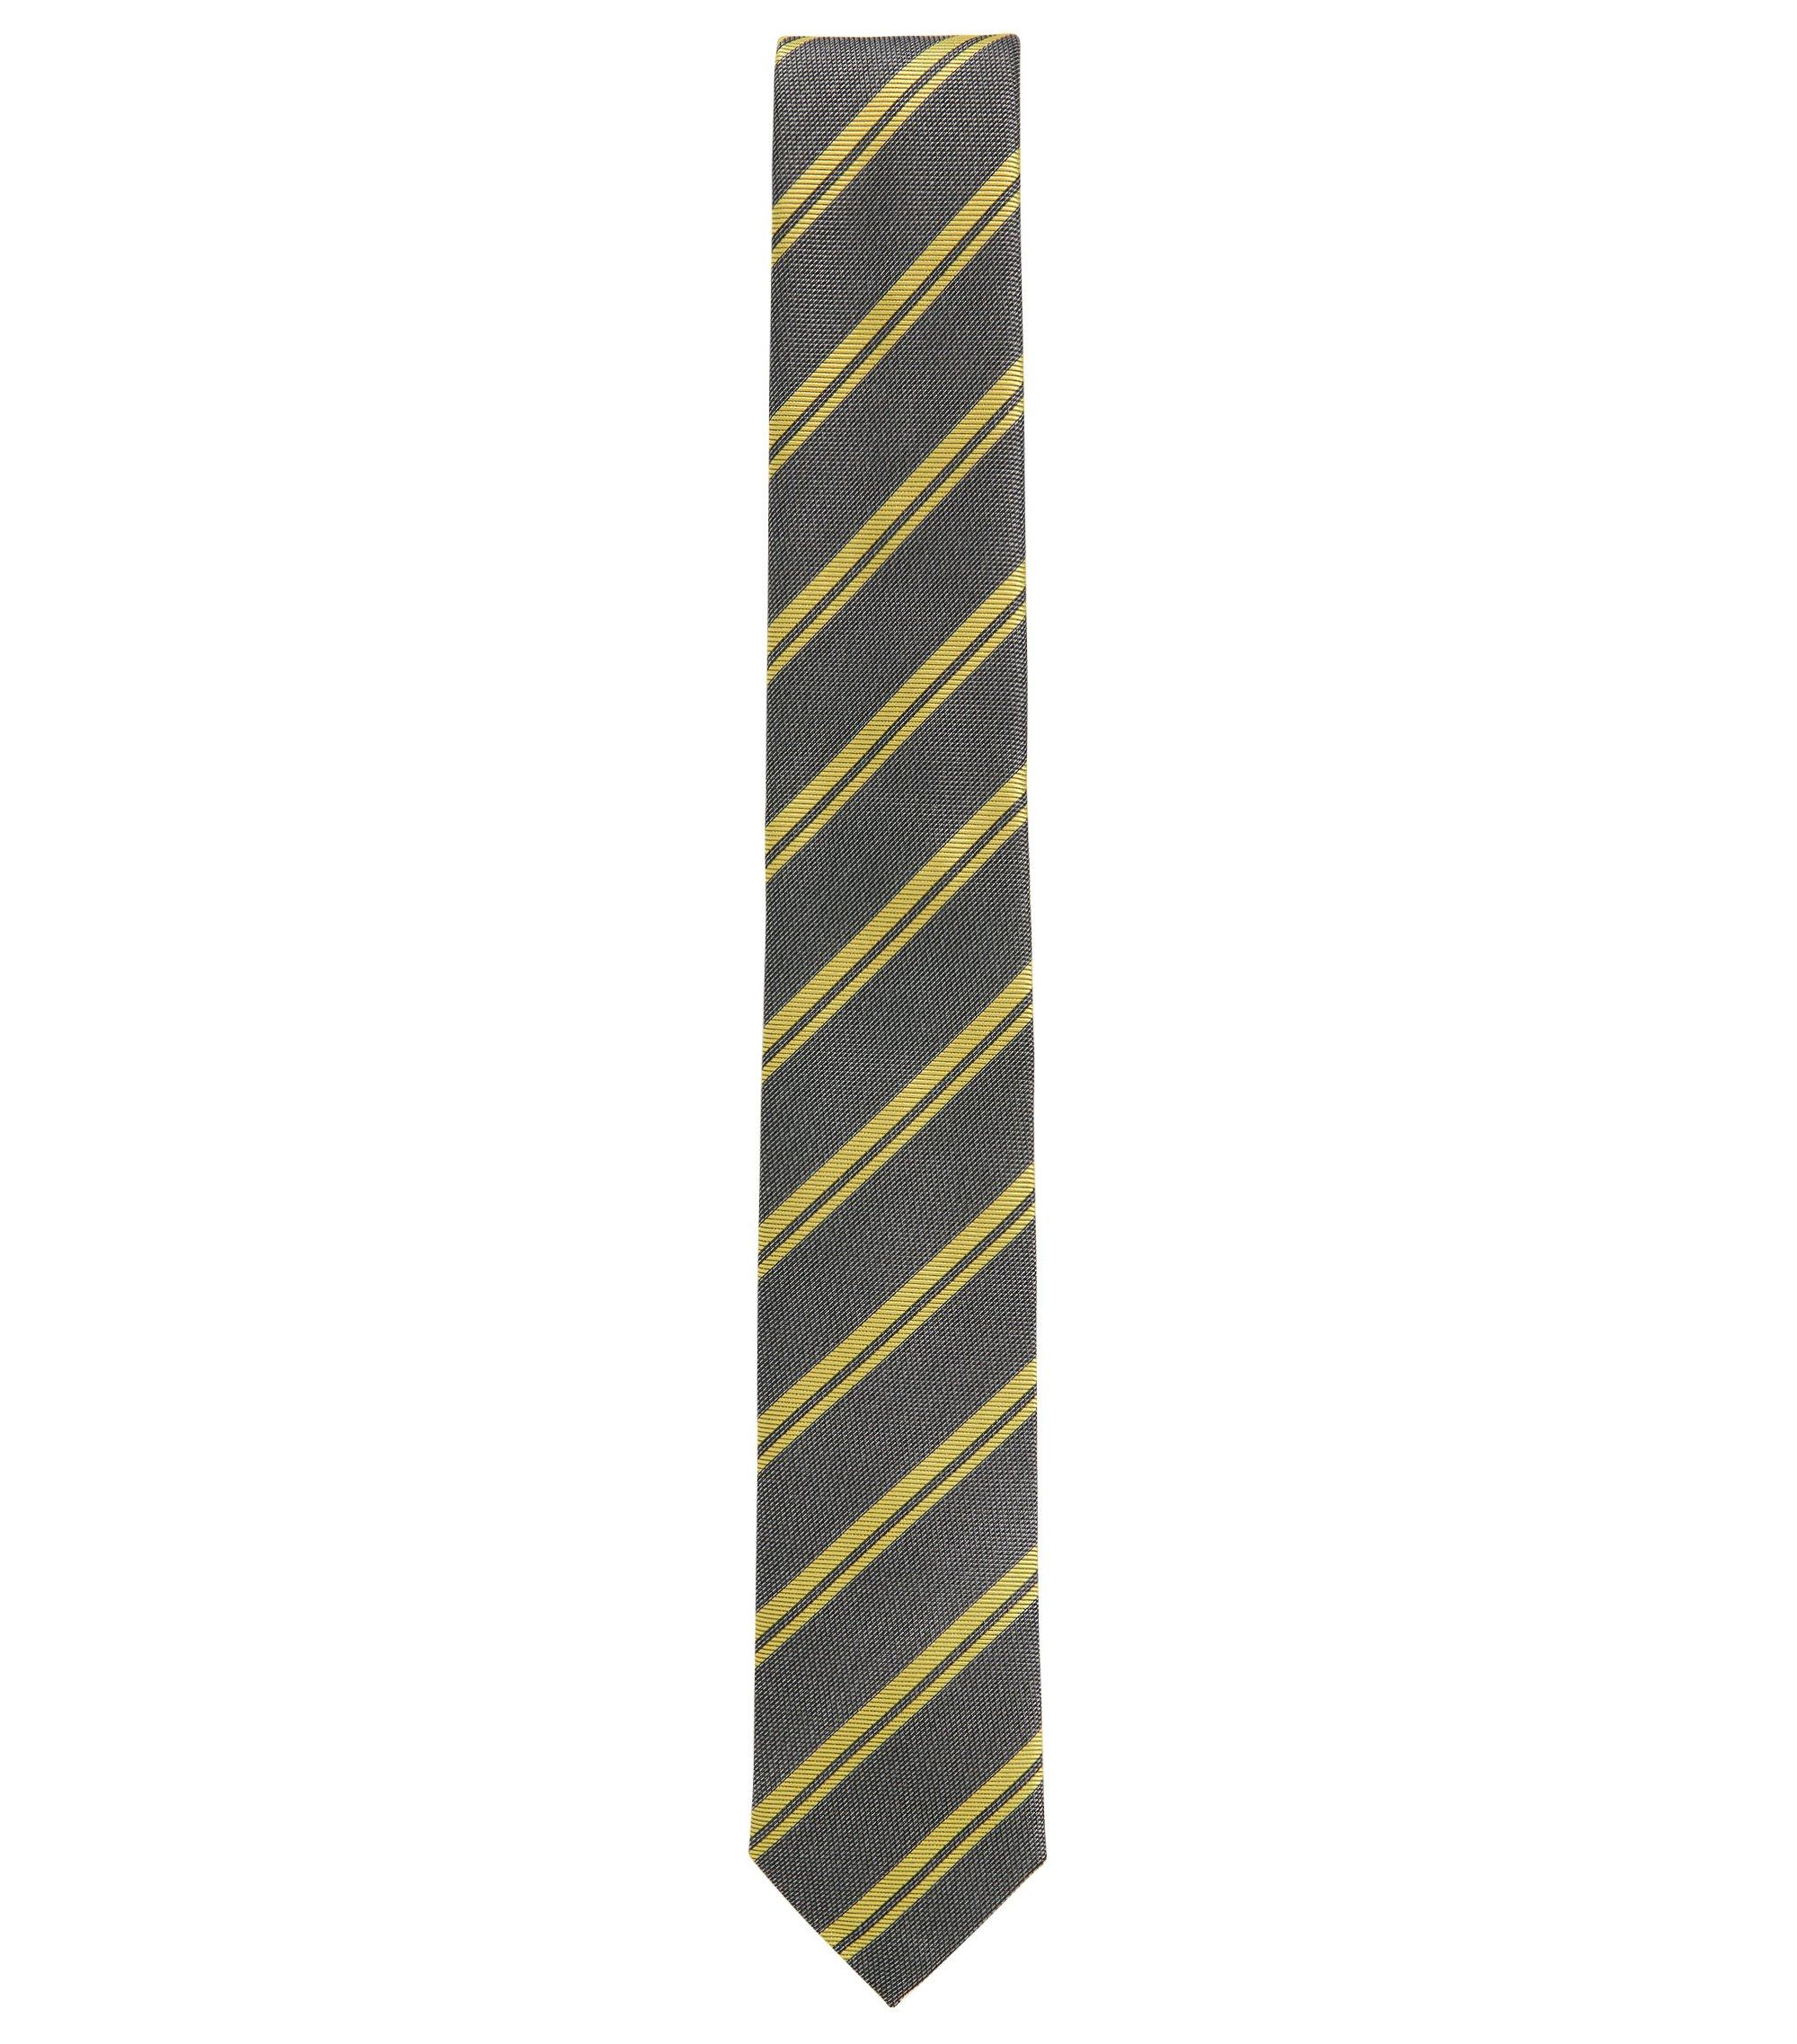 BOSS Tailored Striped Italian Silk Tie, Yellow